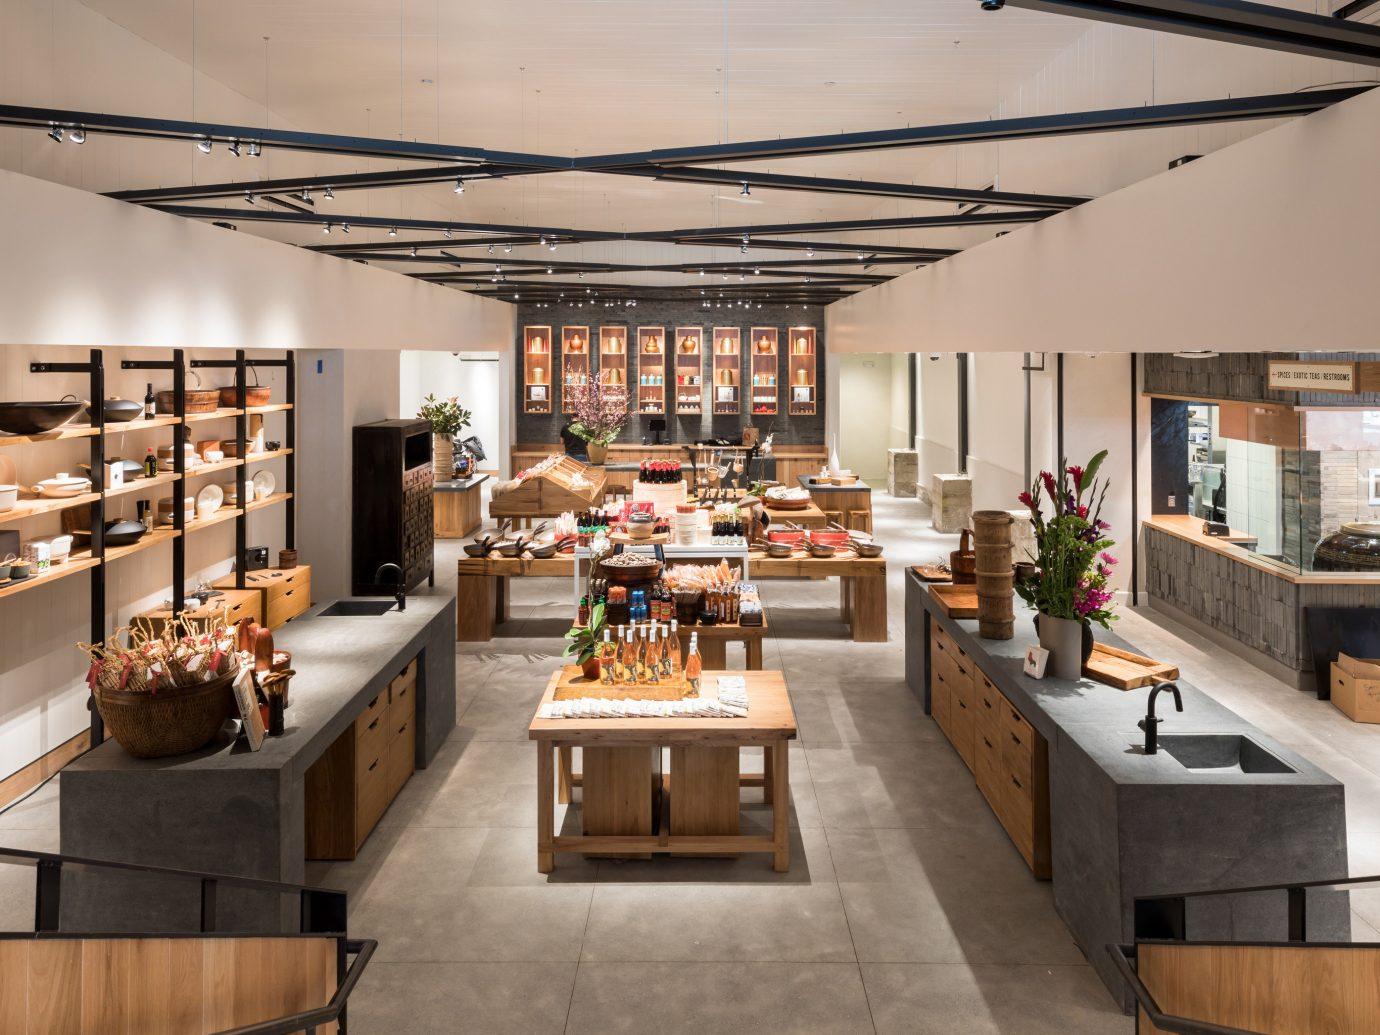 Hotels Trip Ideas indoor table ceiling floor interior design exhibition counter Bar furniture Island